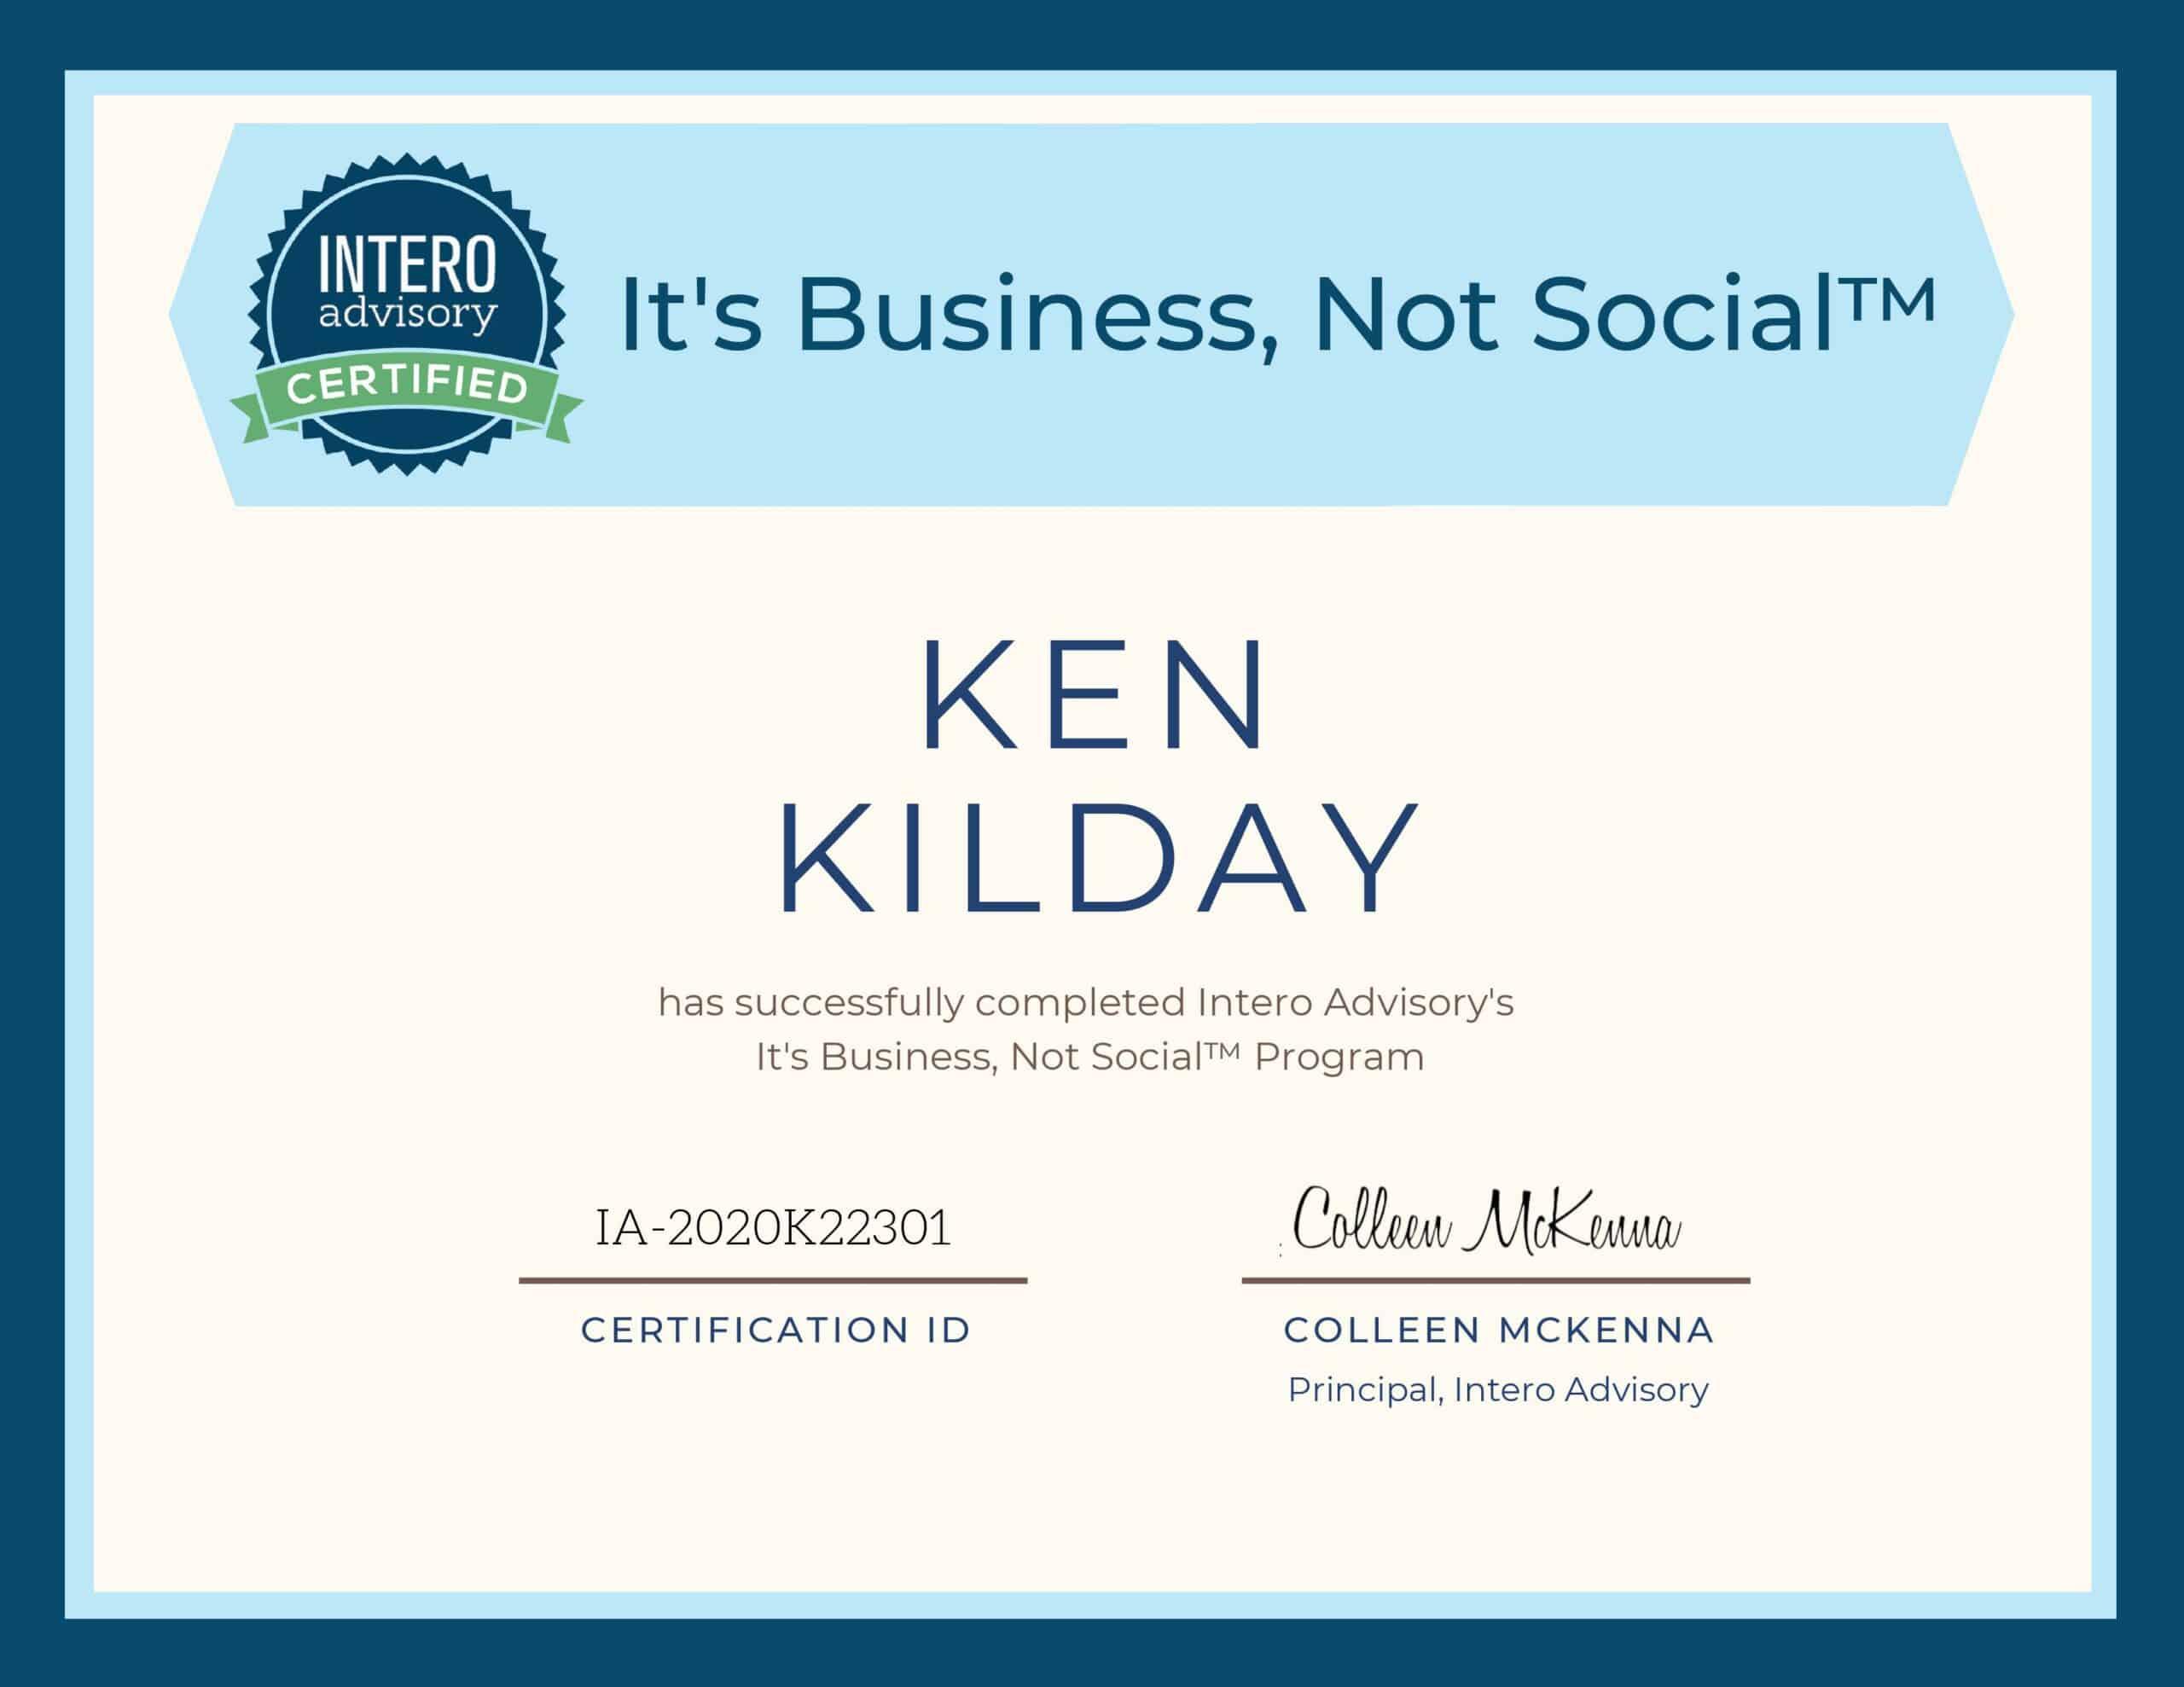 Intero Advisory It's Business not Social Certificate